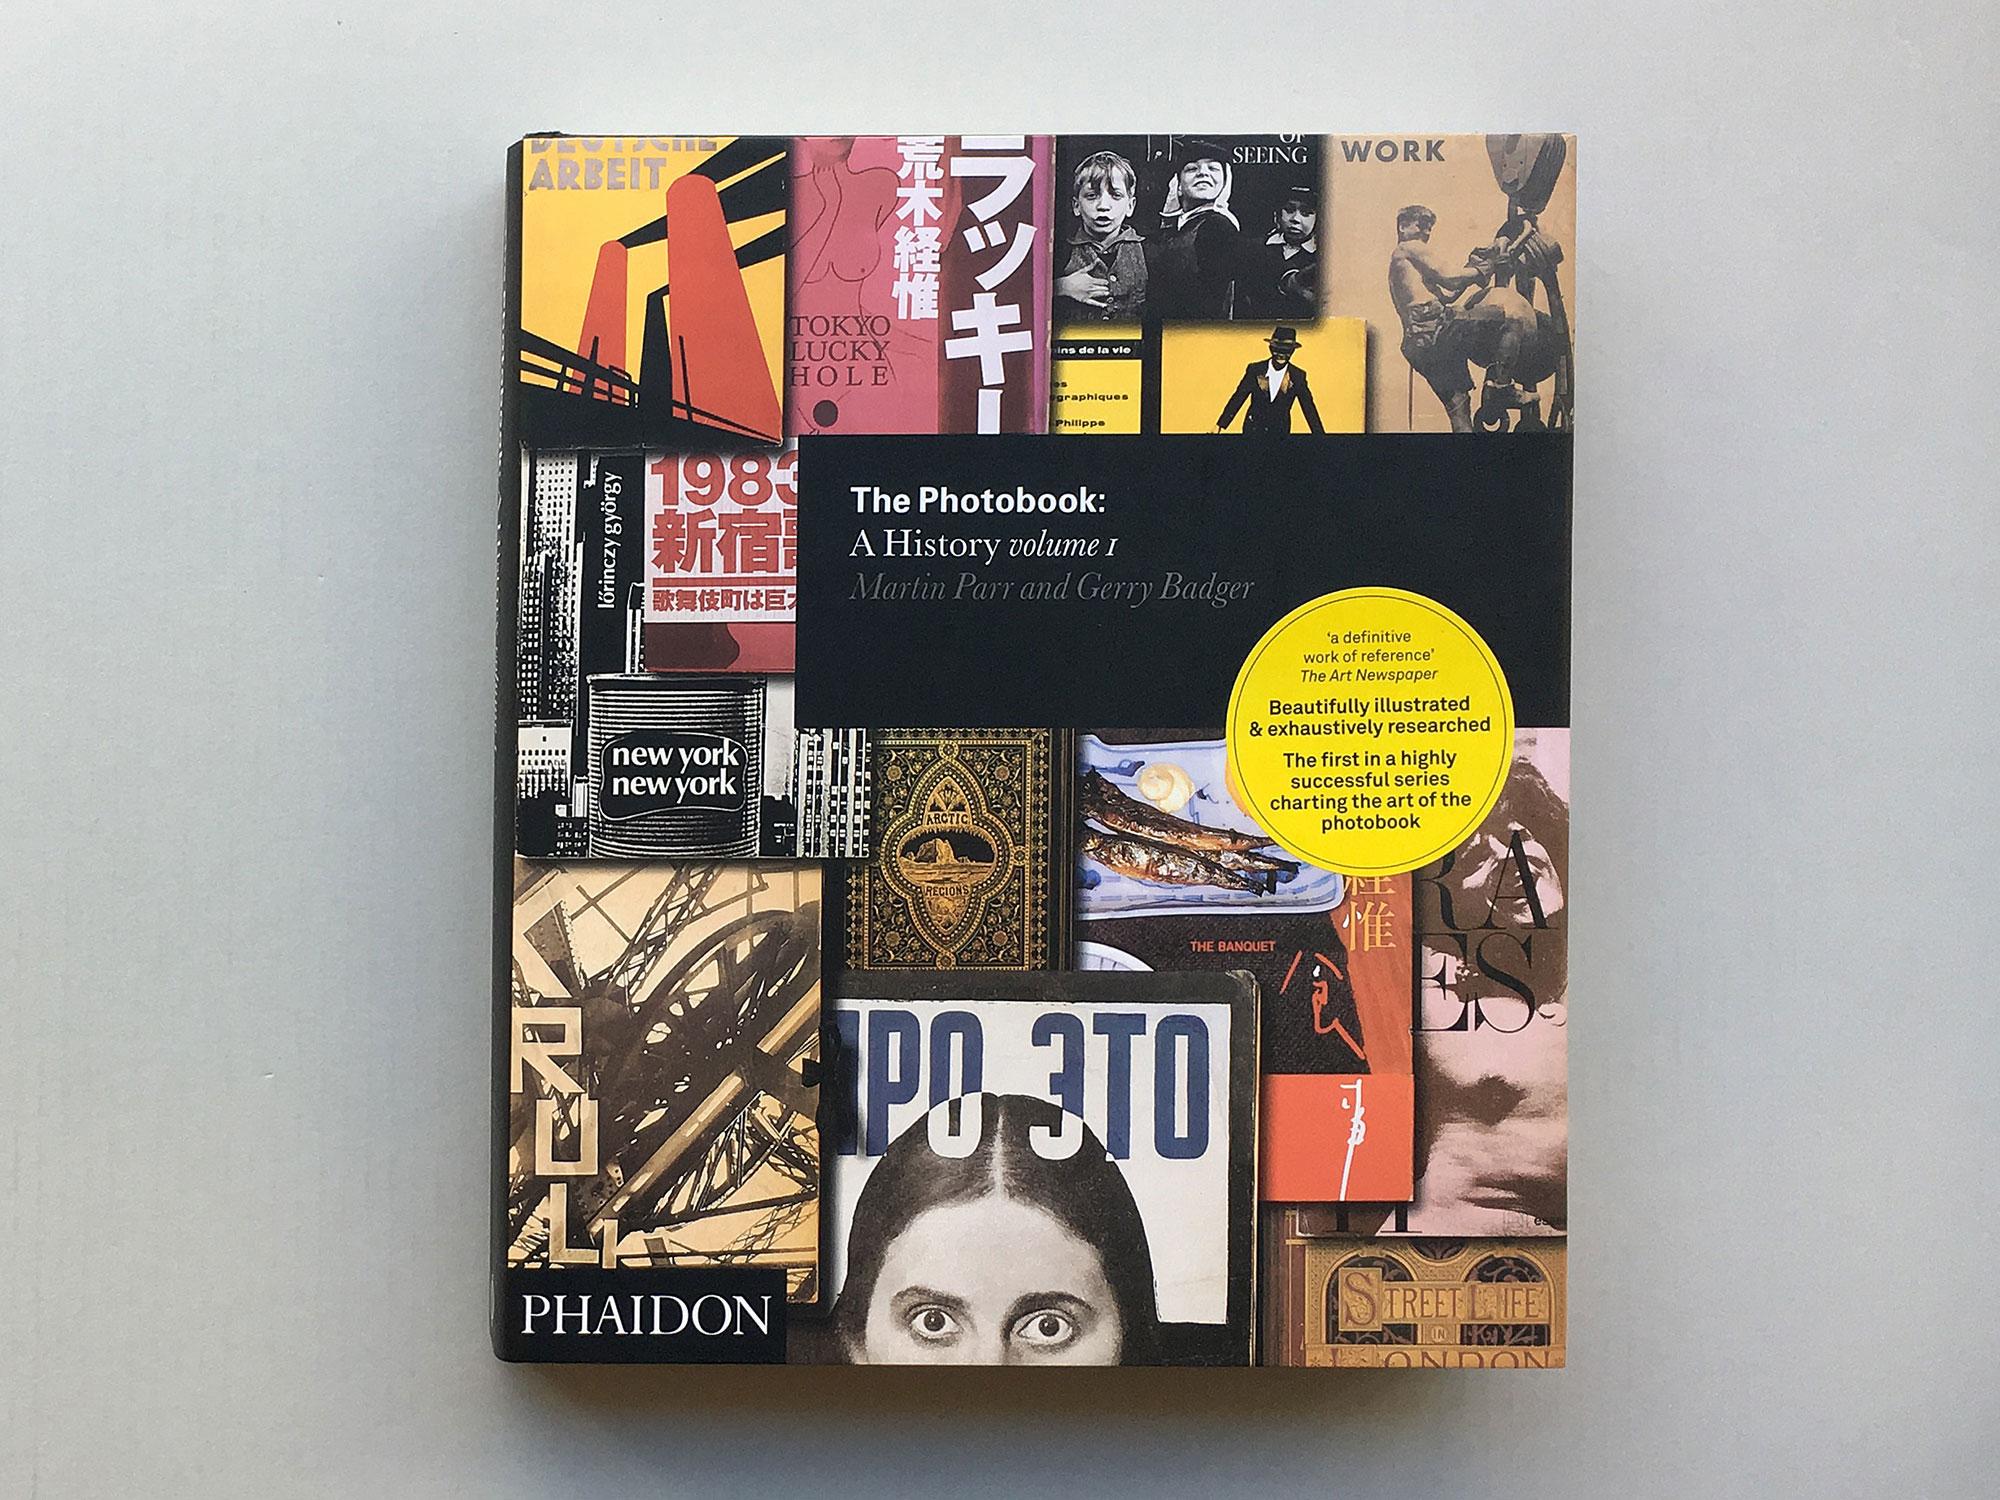 「The Photobook: A History VOLUME 1」